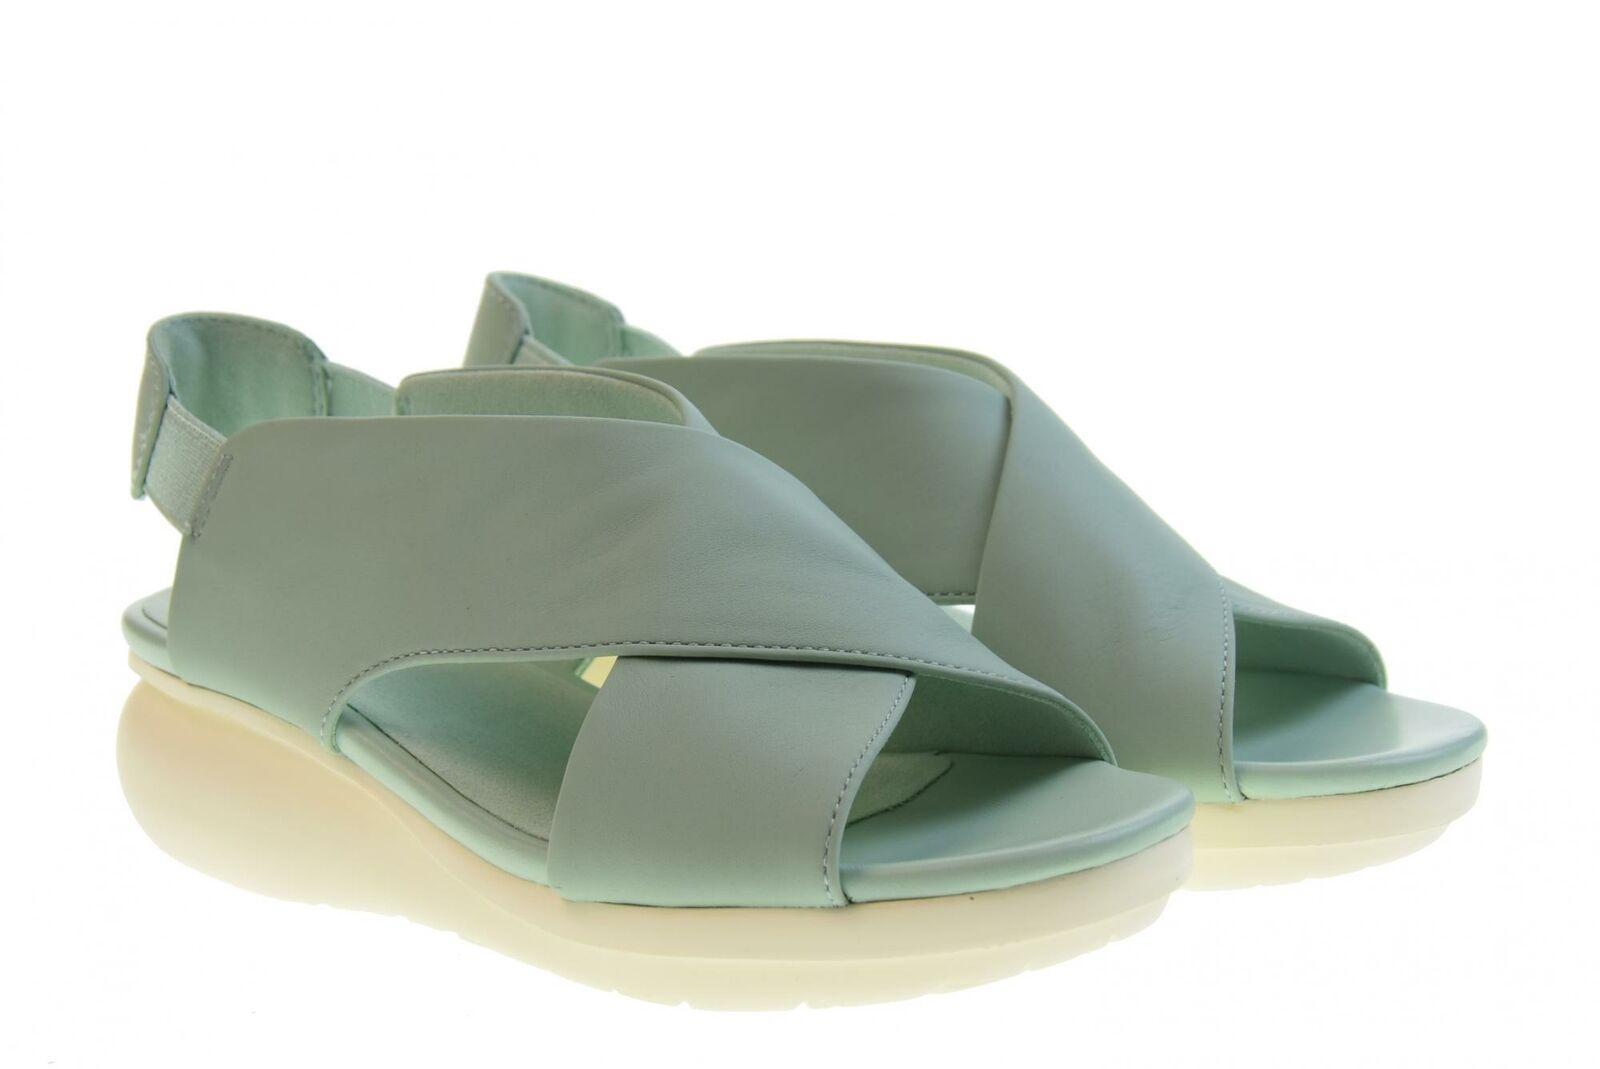 Camper P19u woman sandals wedges K200066-030 GREEN WATER